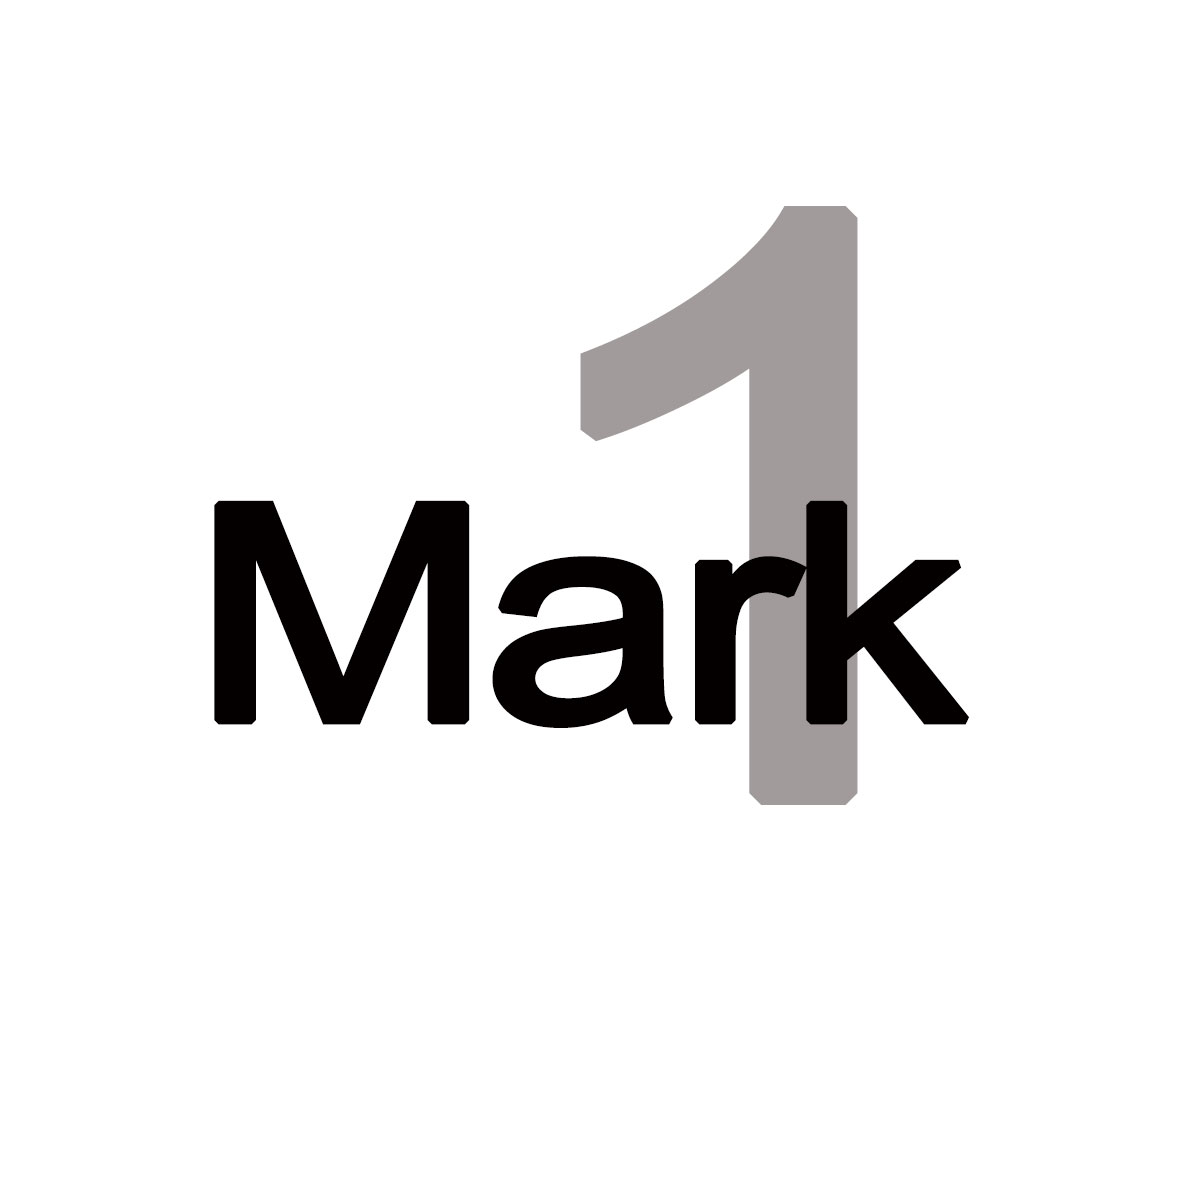 Mark Adams / Mark 1